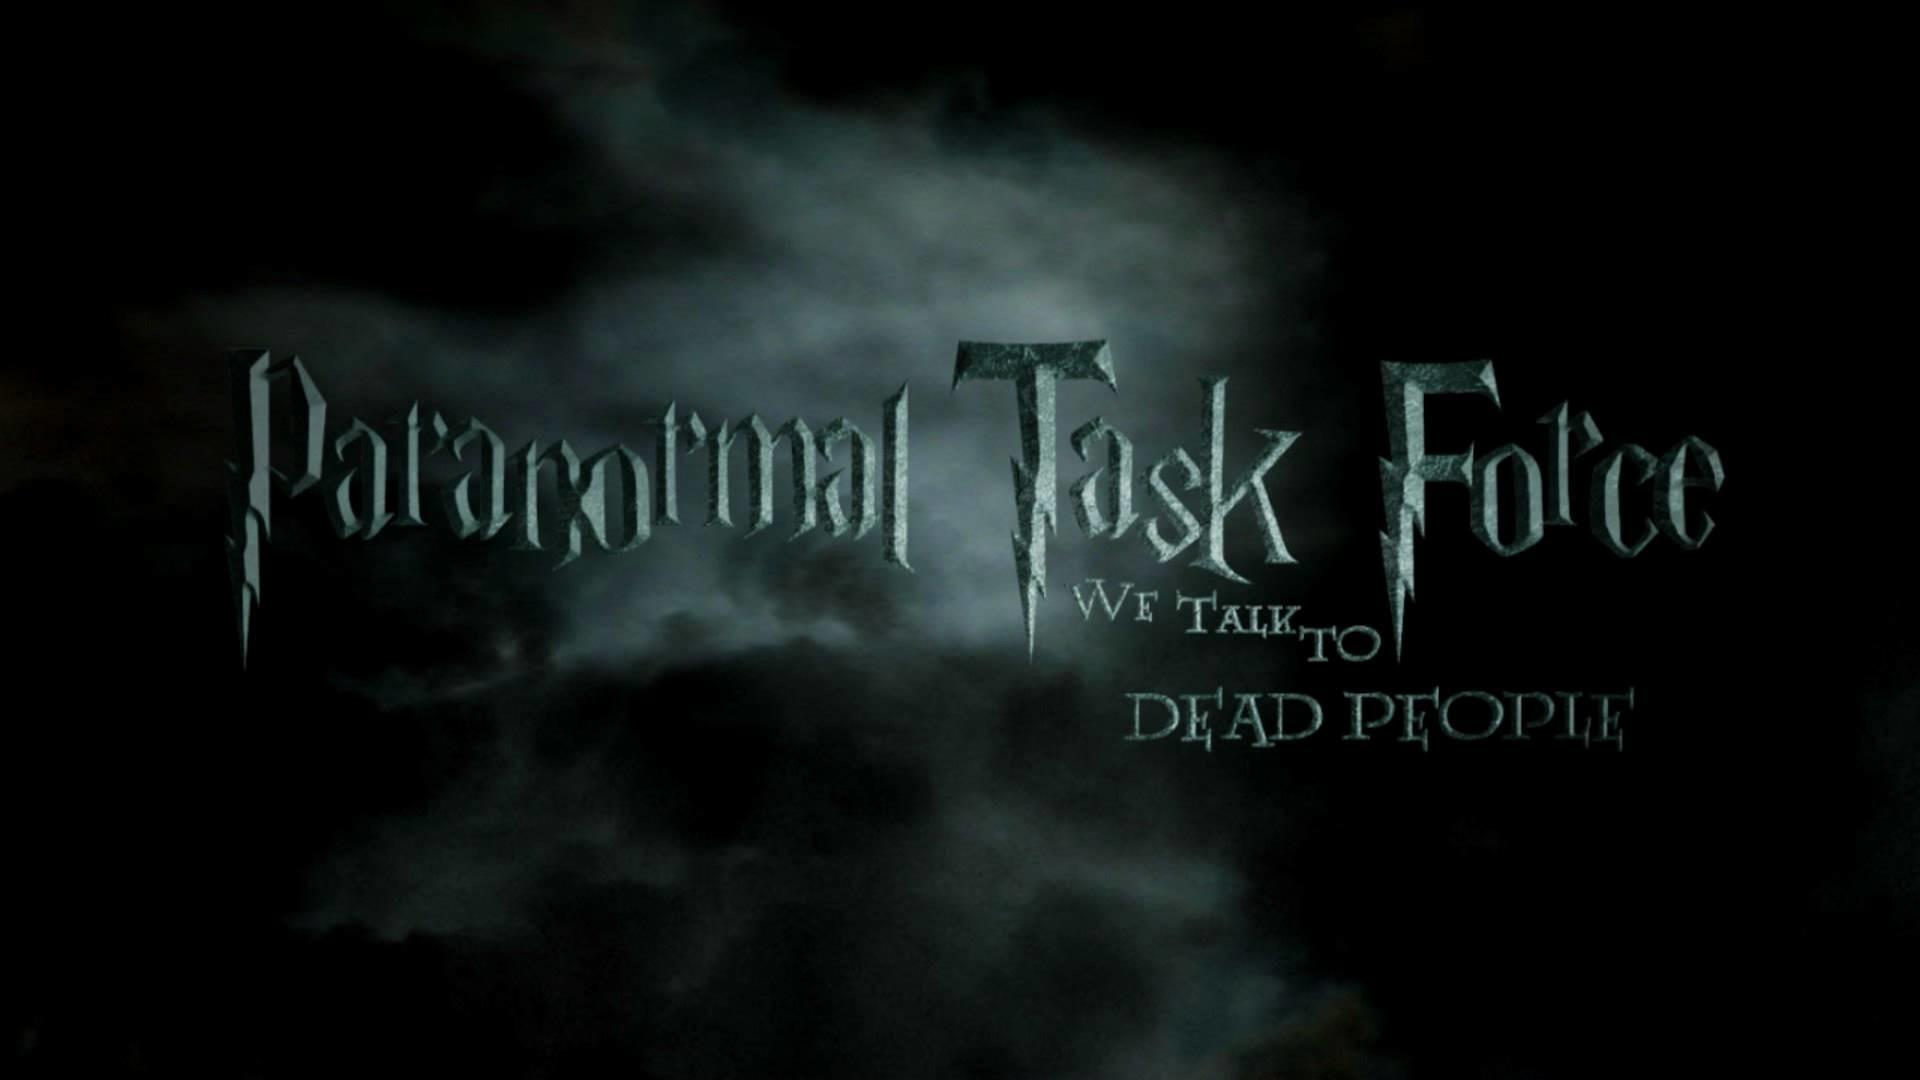 Paranormal Task Force (PTF) – Harry Potter Style Logo